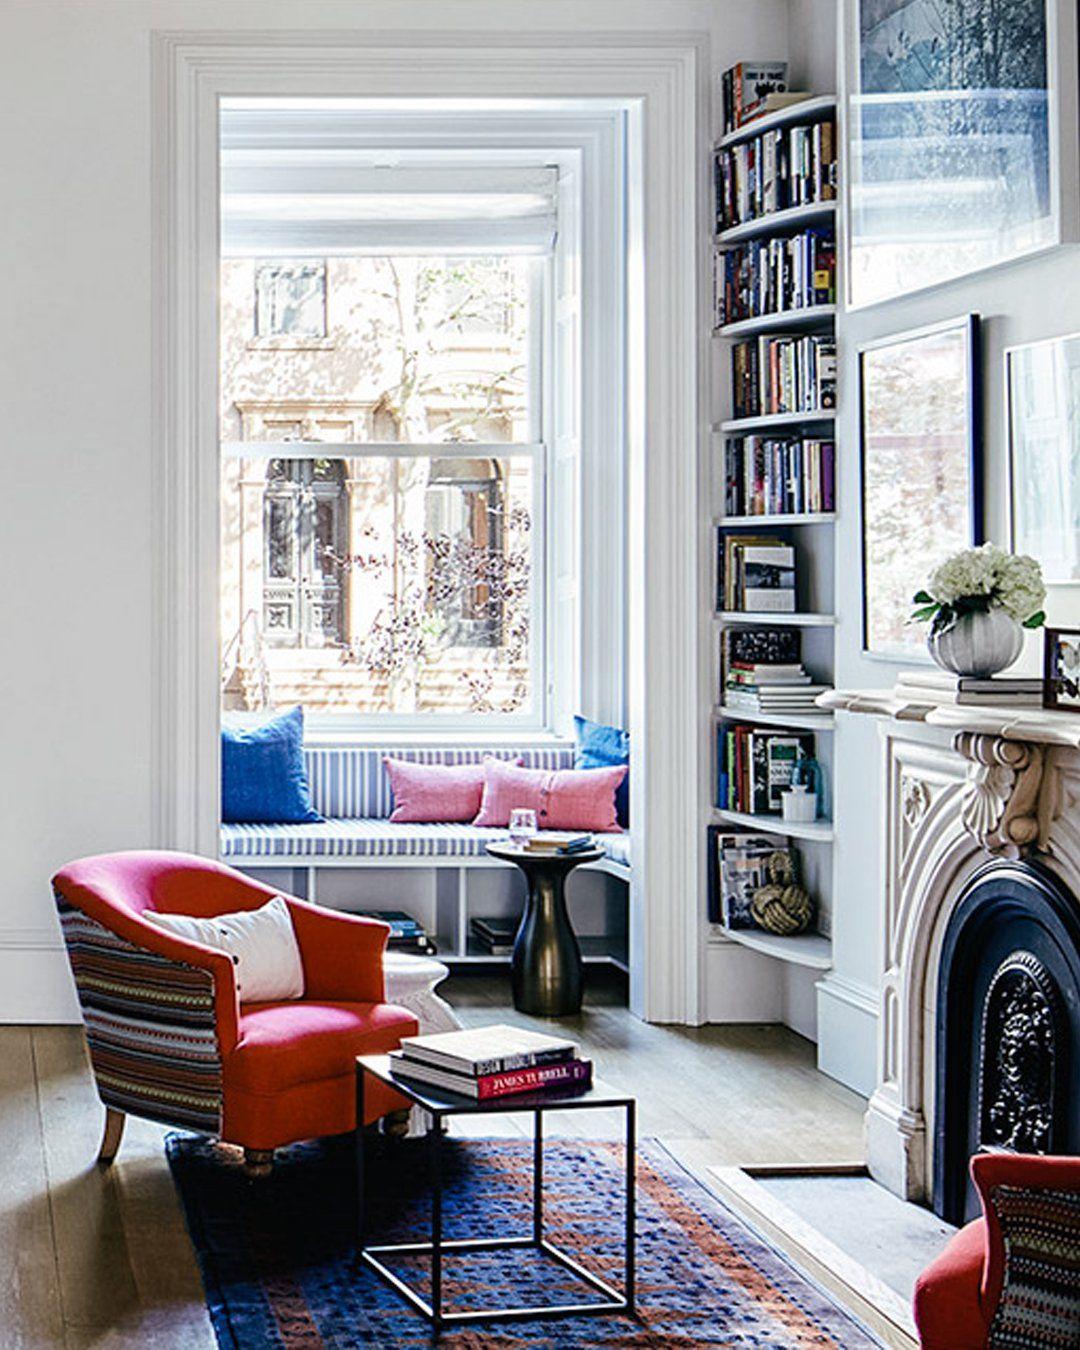 Brownstone Interior Design Ideas Small Kitchen: Brooklyn Brownstone In